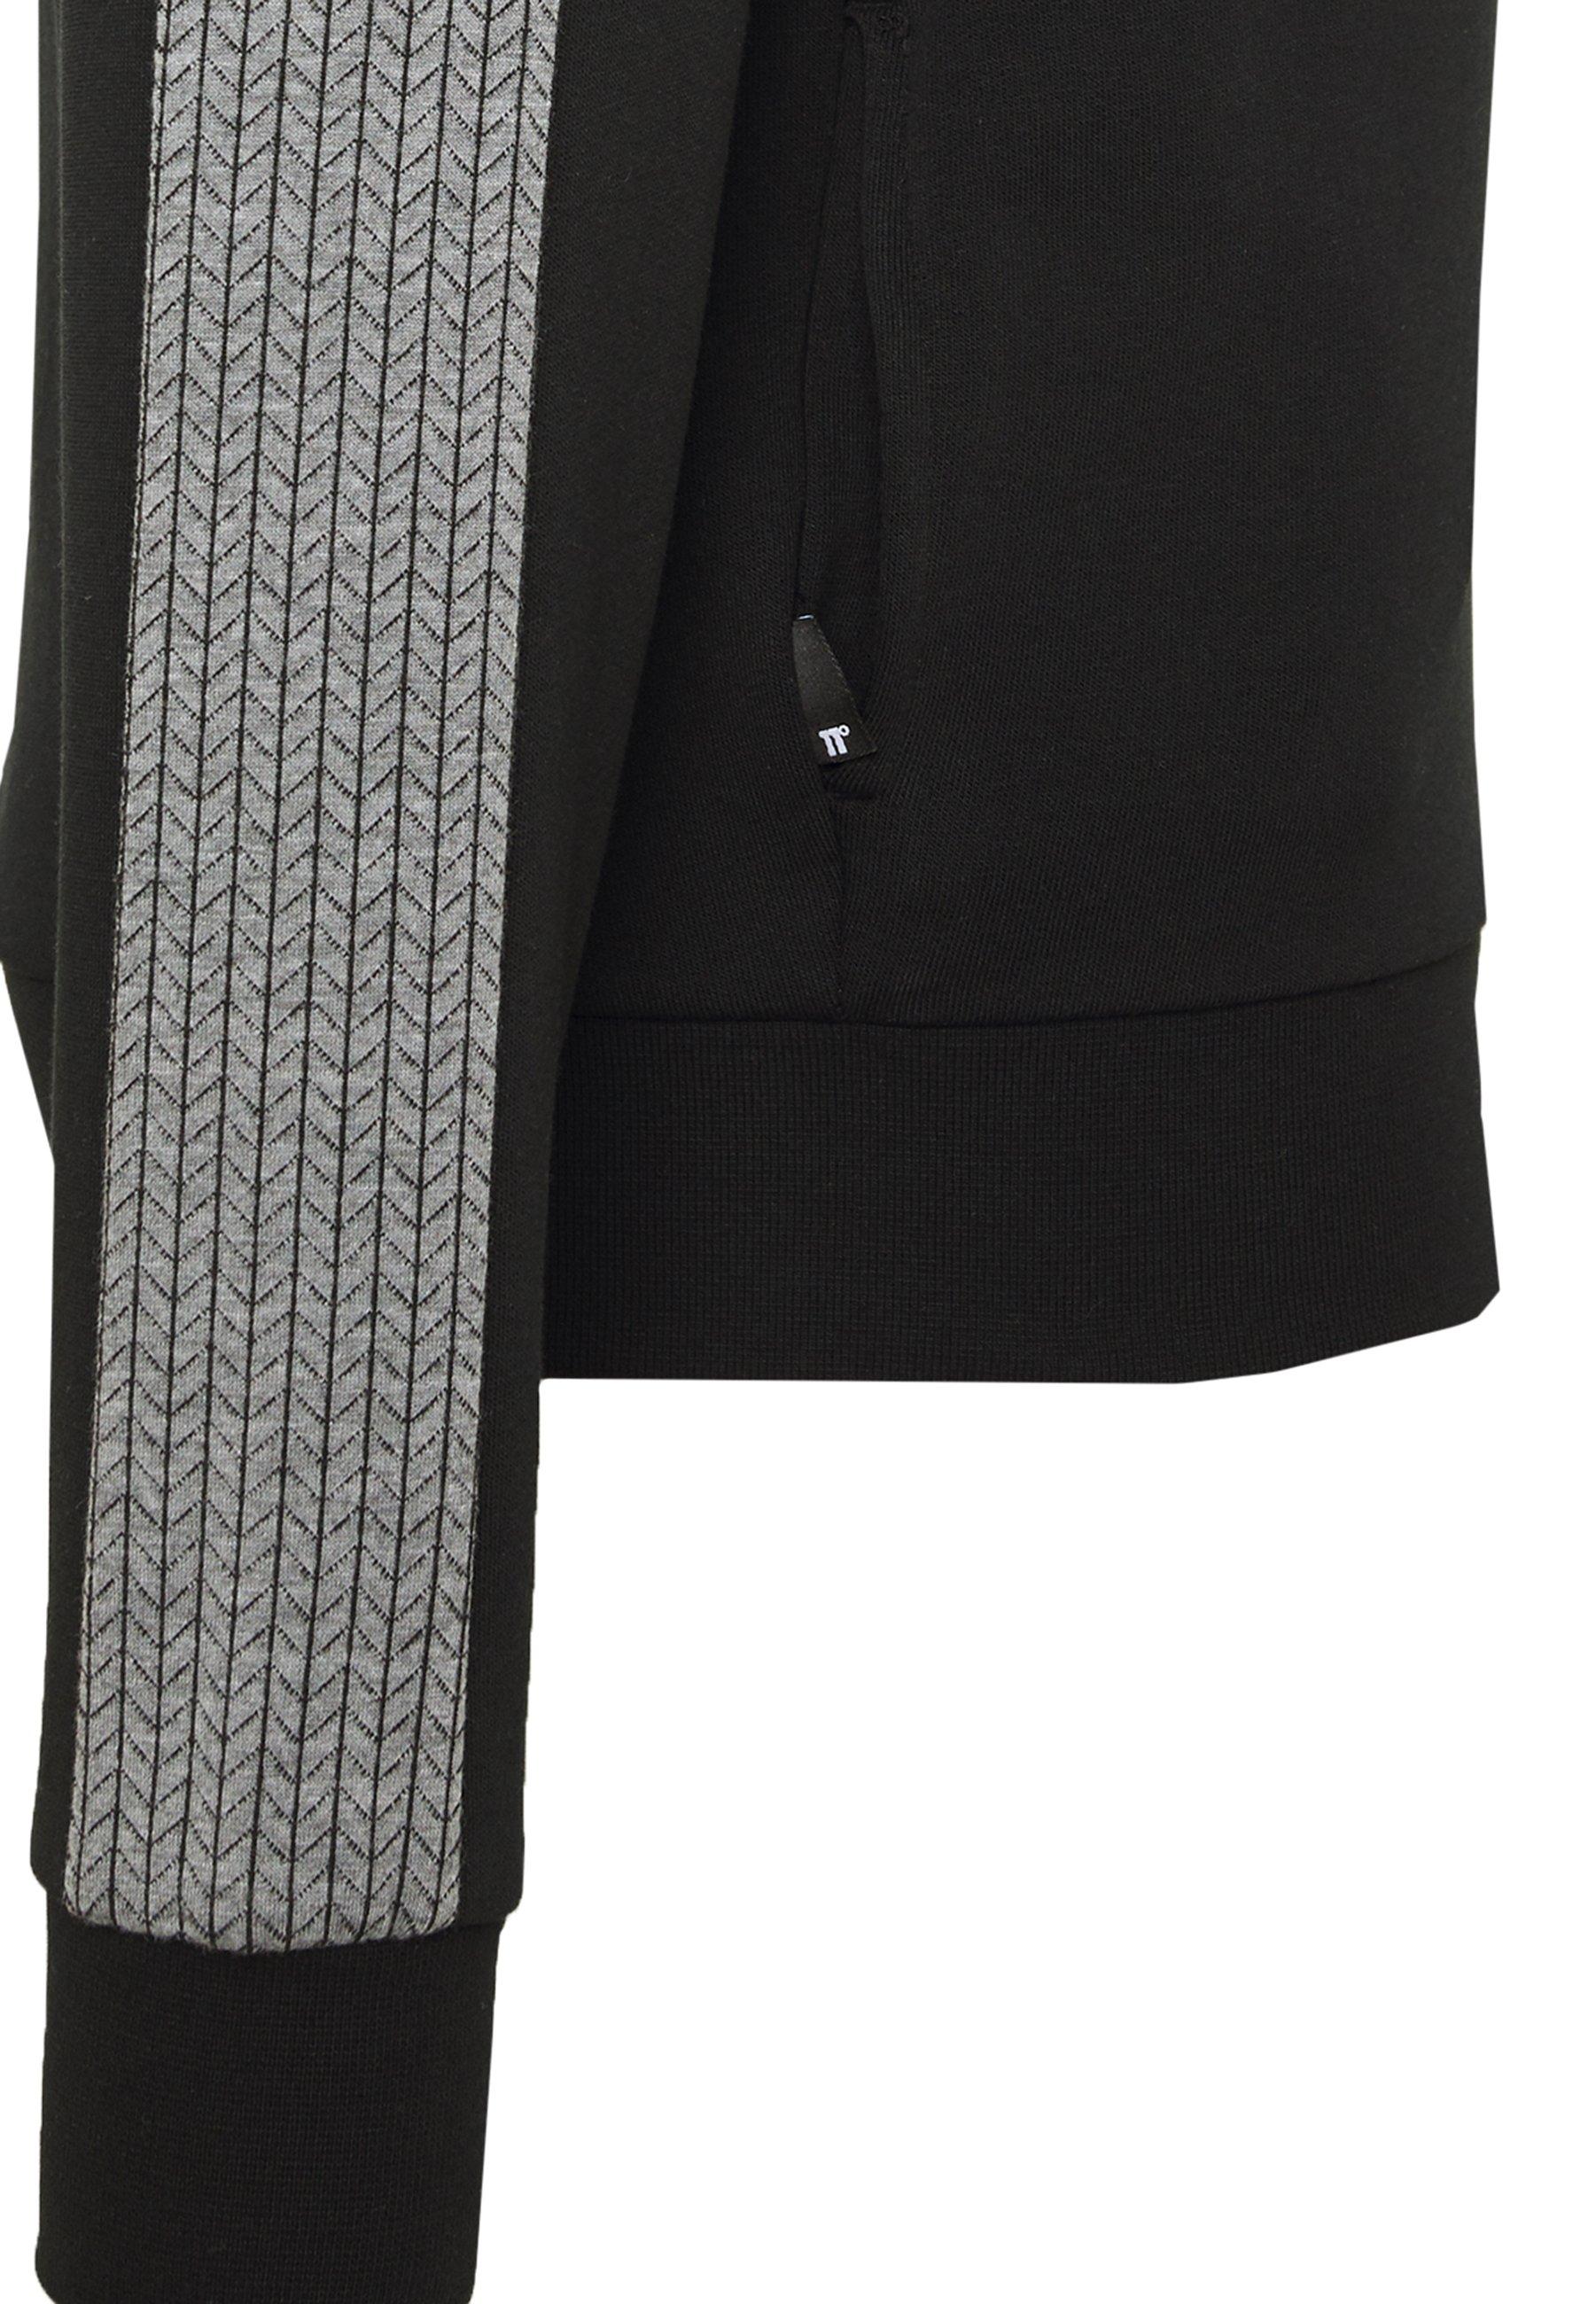 11 DEGREES HERRINGBONE  - Luvtröja - black - Herrkläder Rabatter